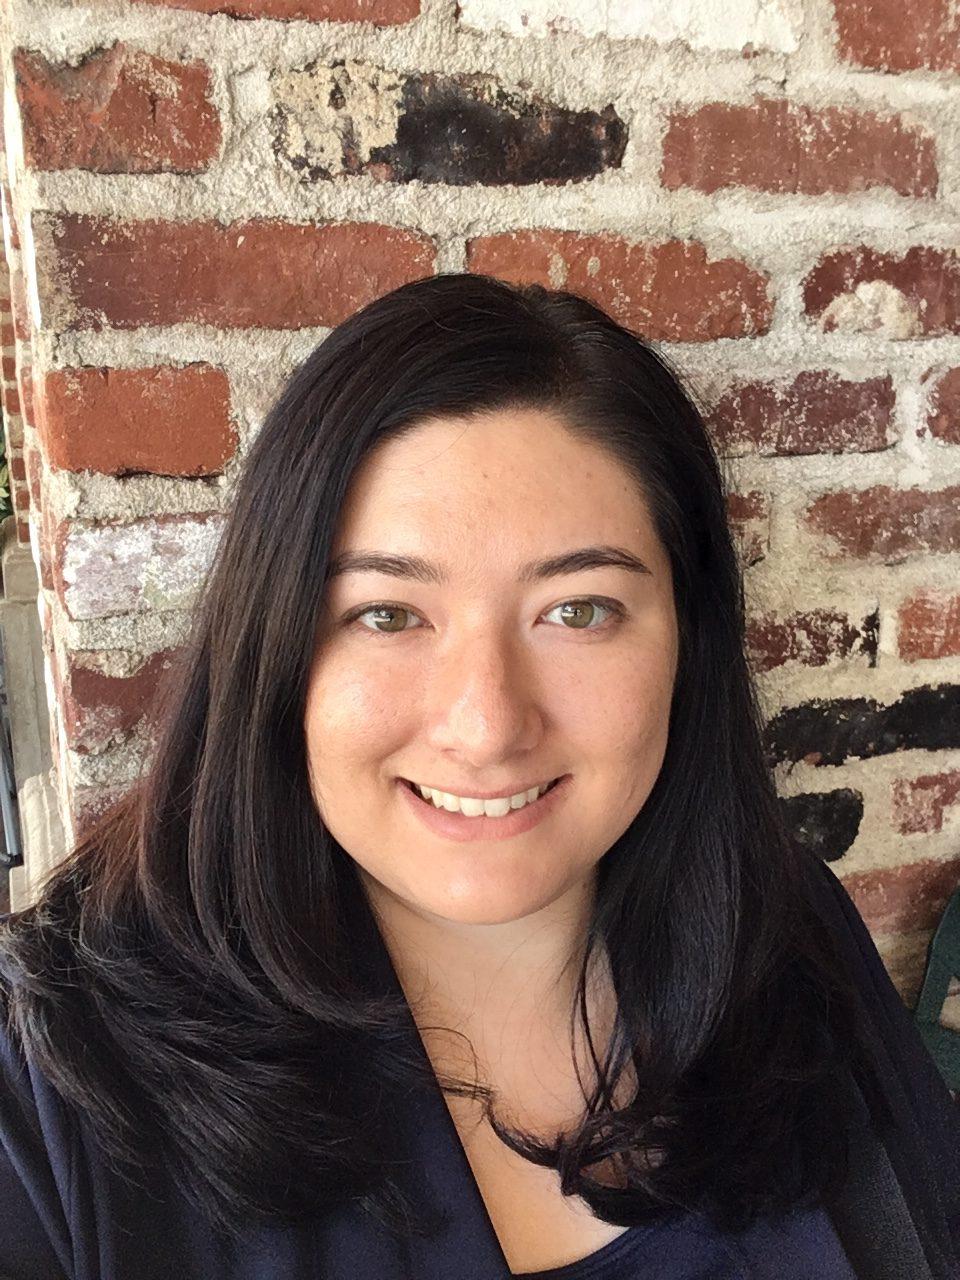 Tara Brown, UCLA, DRI2019 Speaker